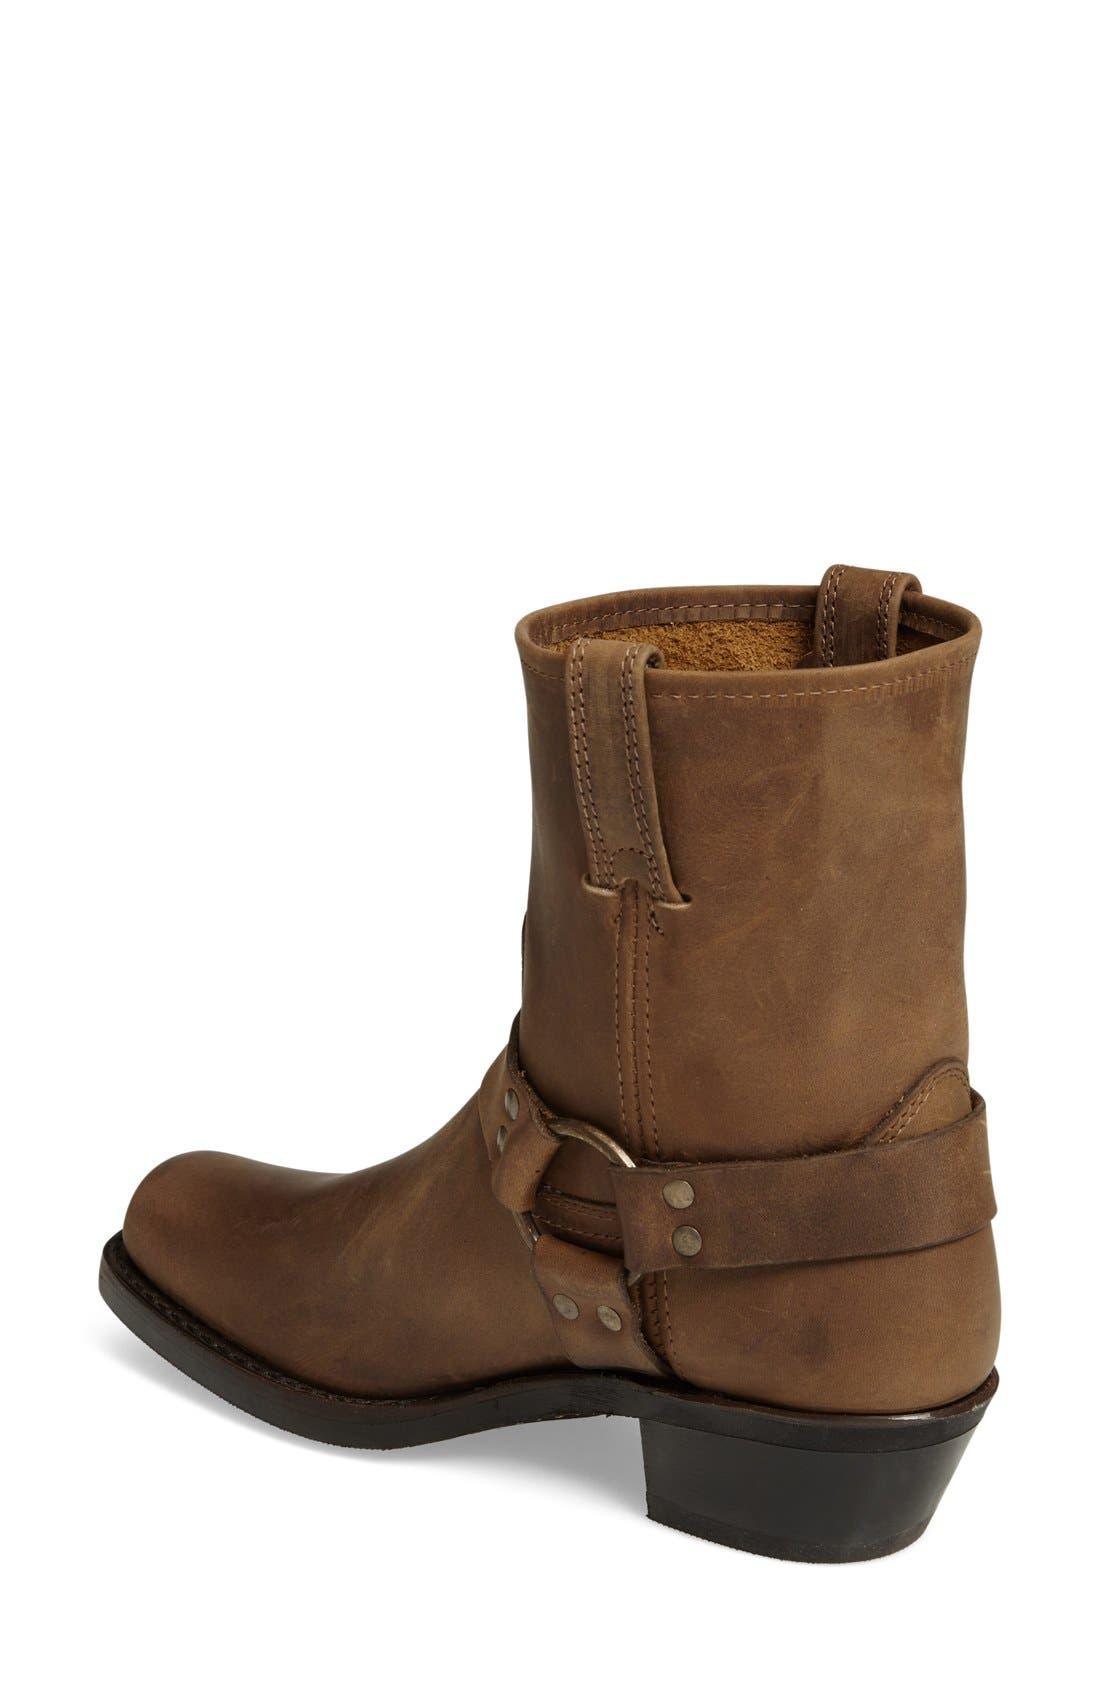 Harness Square Toe Engineer Boot,                             Alternate thumbnail 2, color,                             TAN